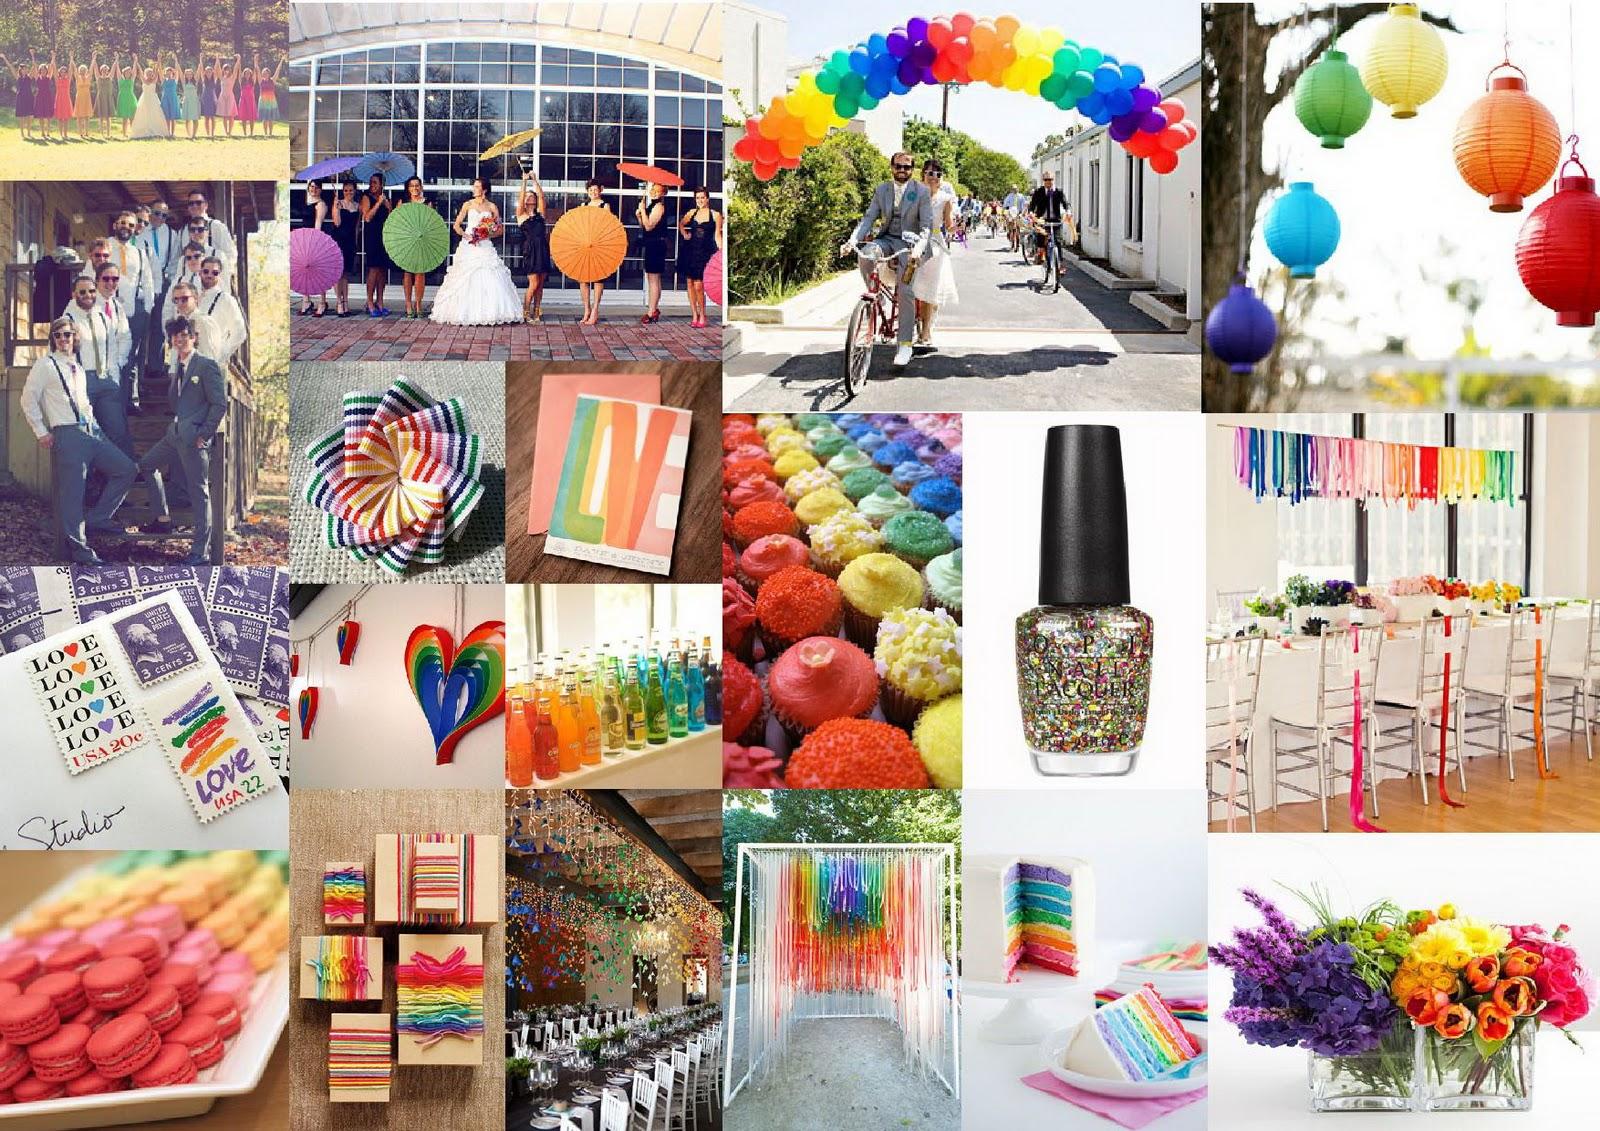 Matrimonio Tema Arcobaleno : Spunto per tema matrimonio l arcobaleno pagina